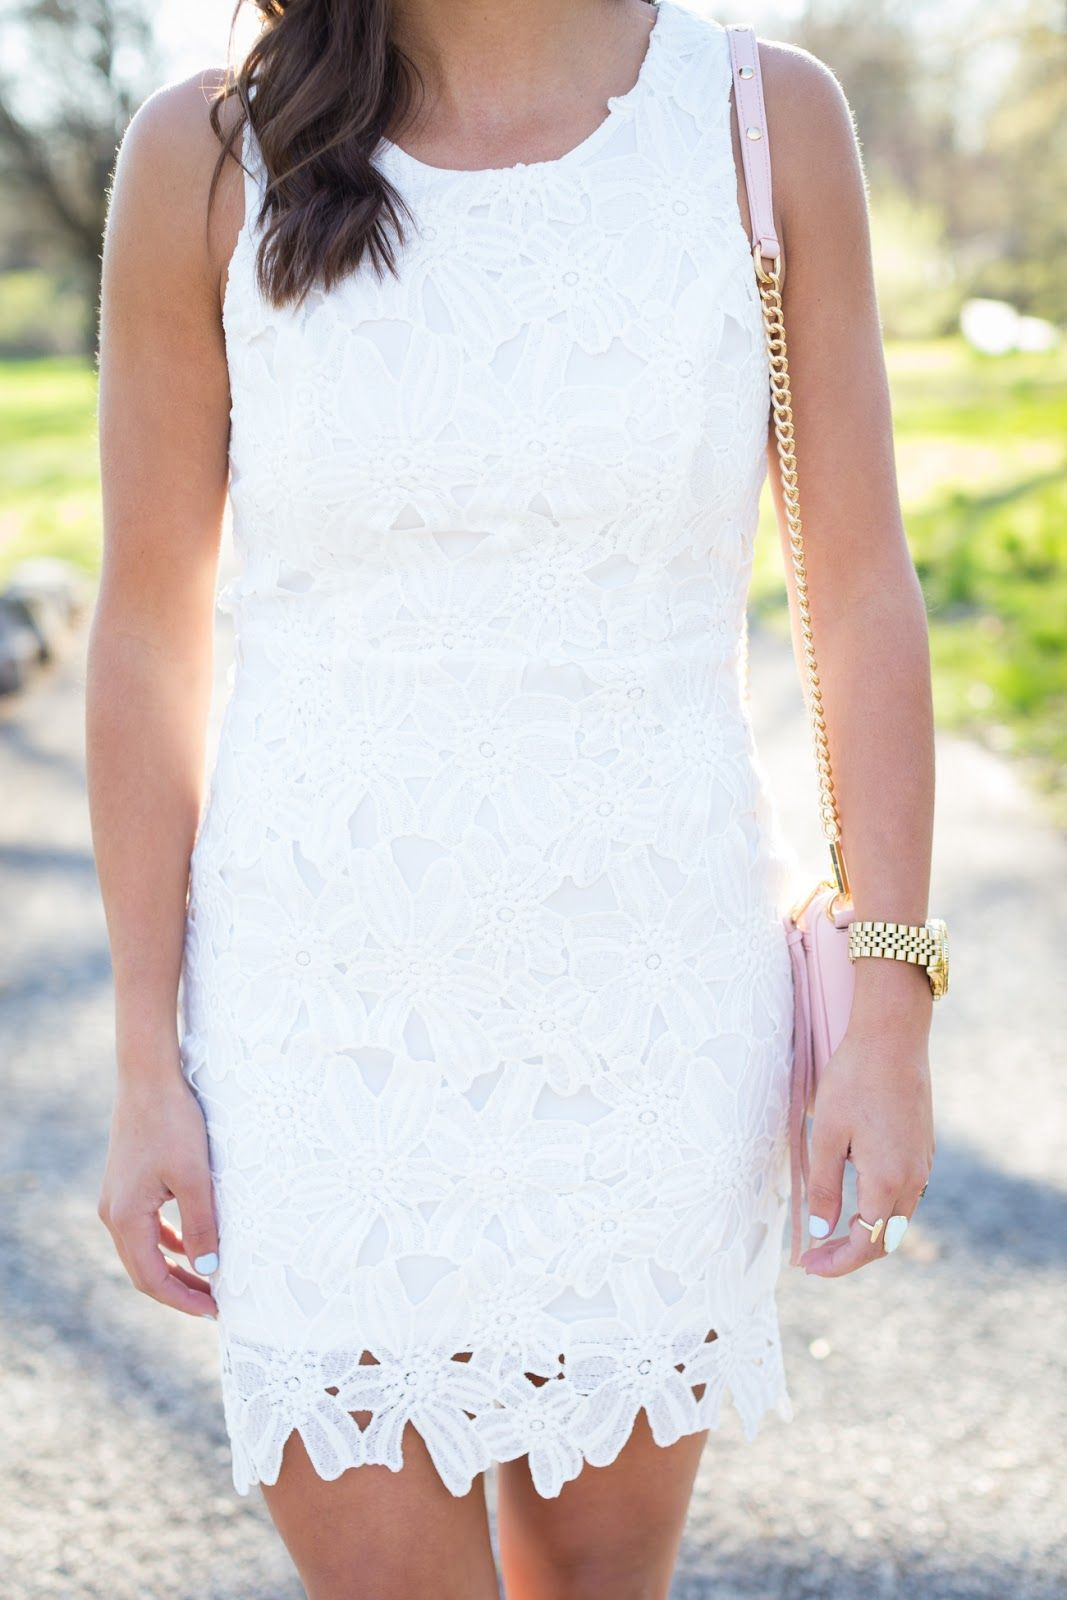 white-lace-dress-1263.jpg 1.067×1.600 piksel